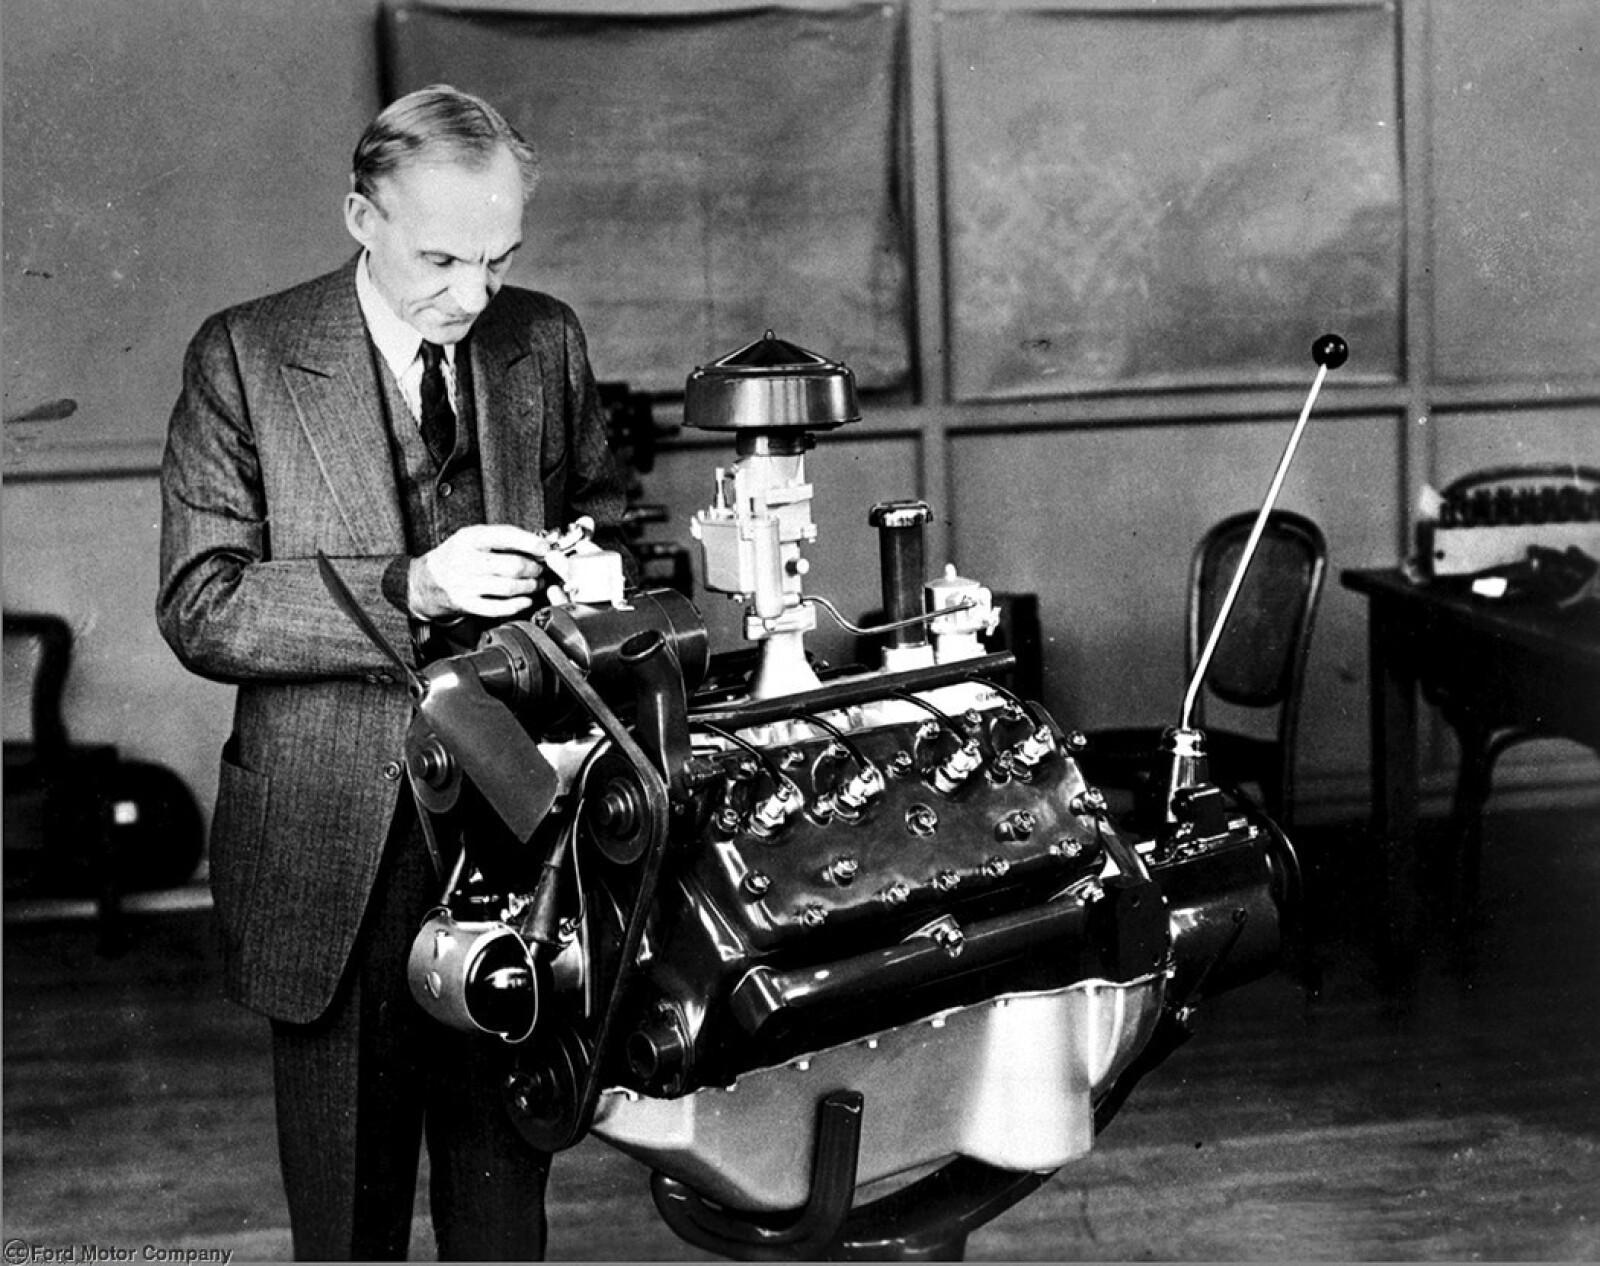 A new V-8 engine